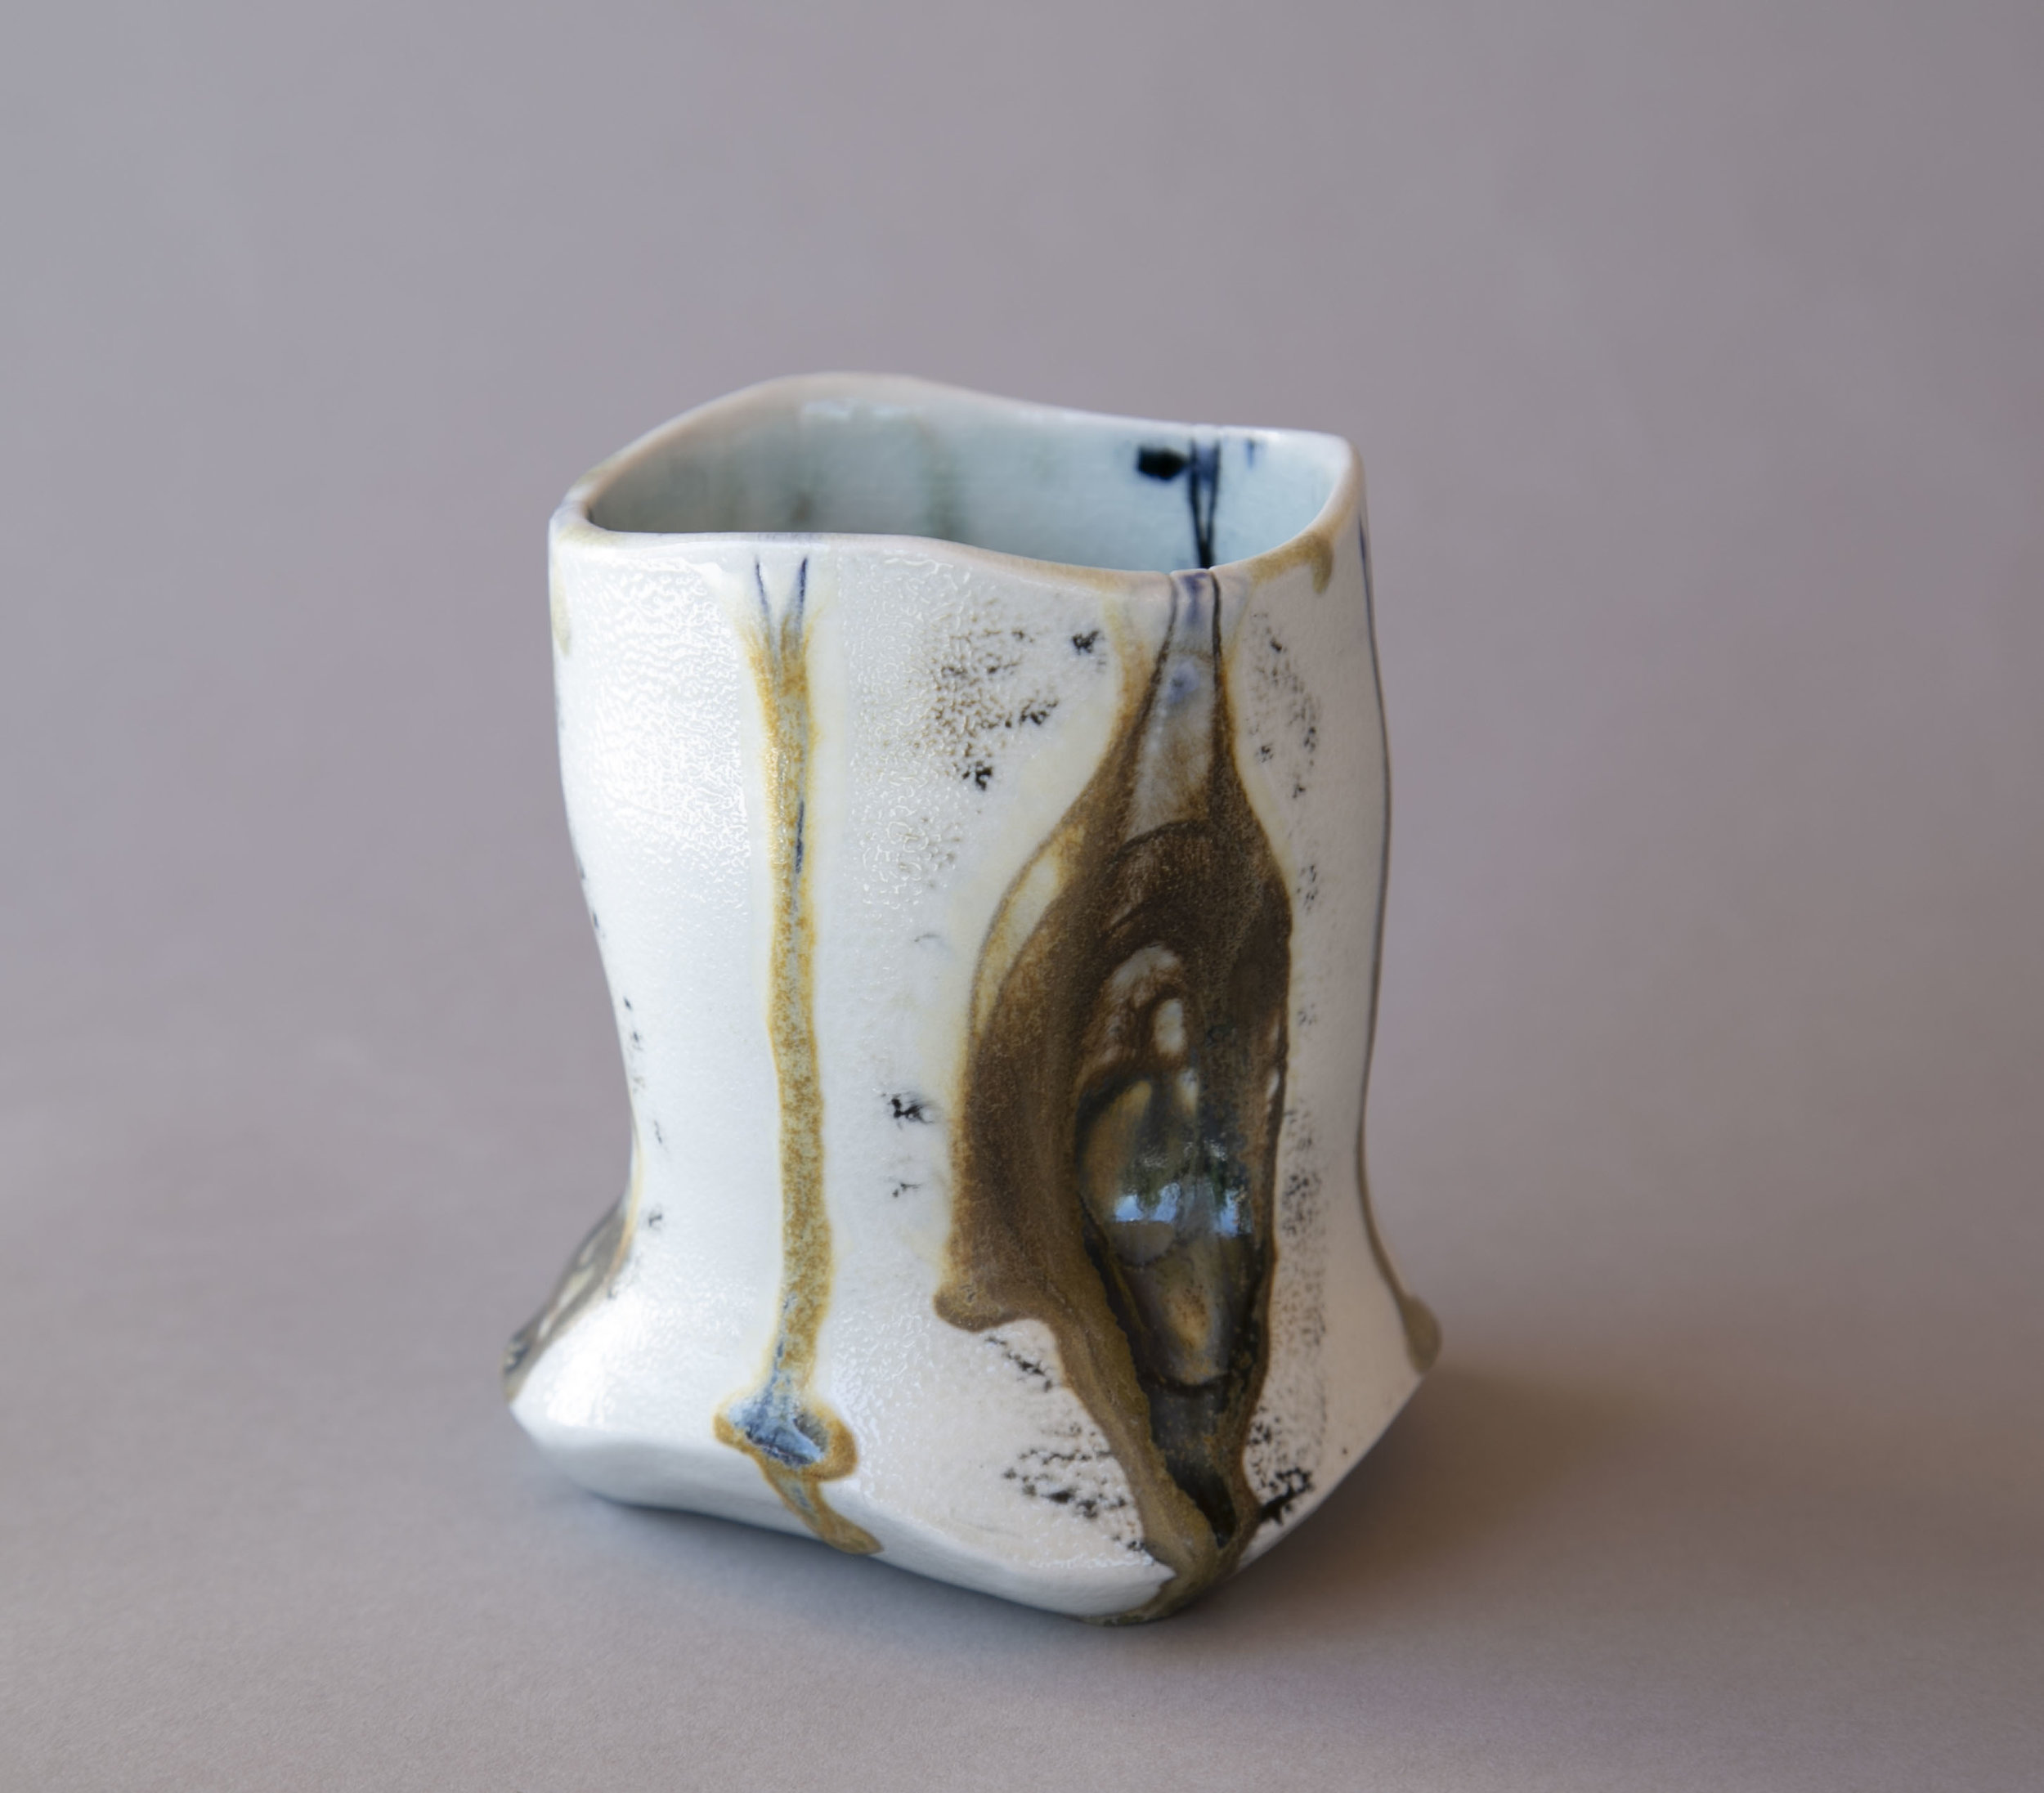 Bannerot, Julia, Tumbler, Cone 10 soda fired porcelain, $55, 719-213-8764.jpg